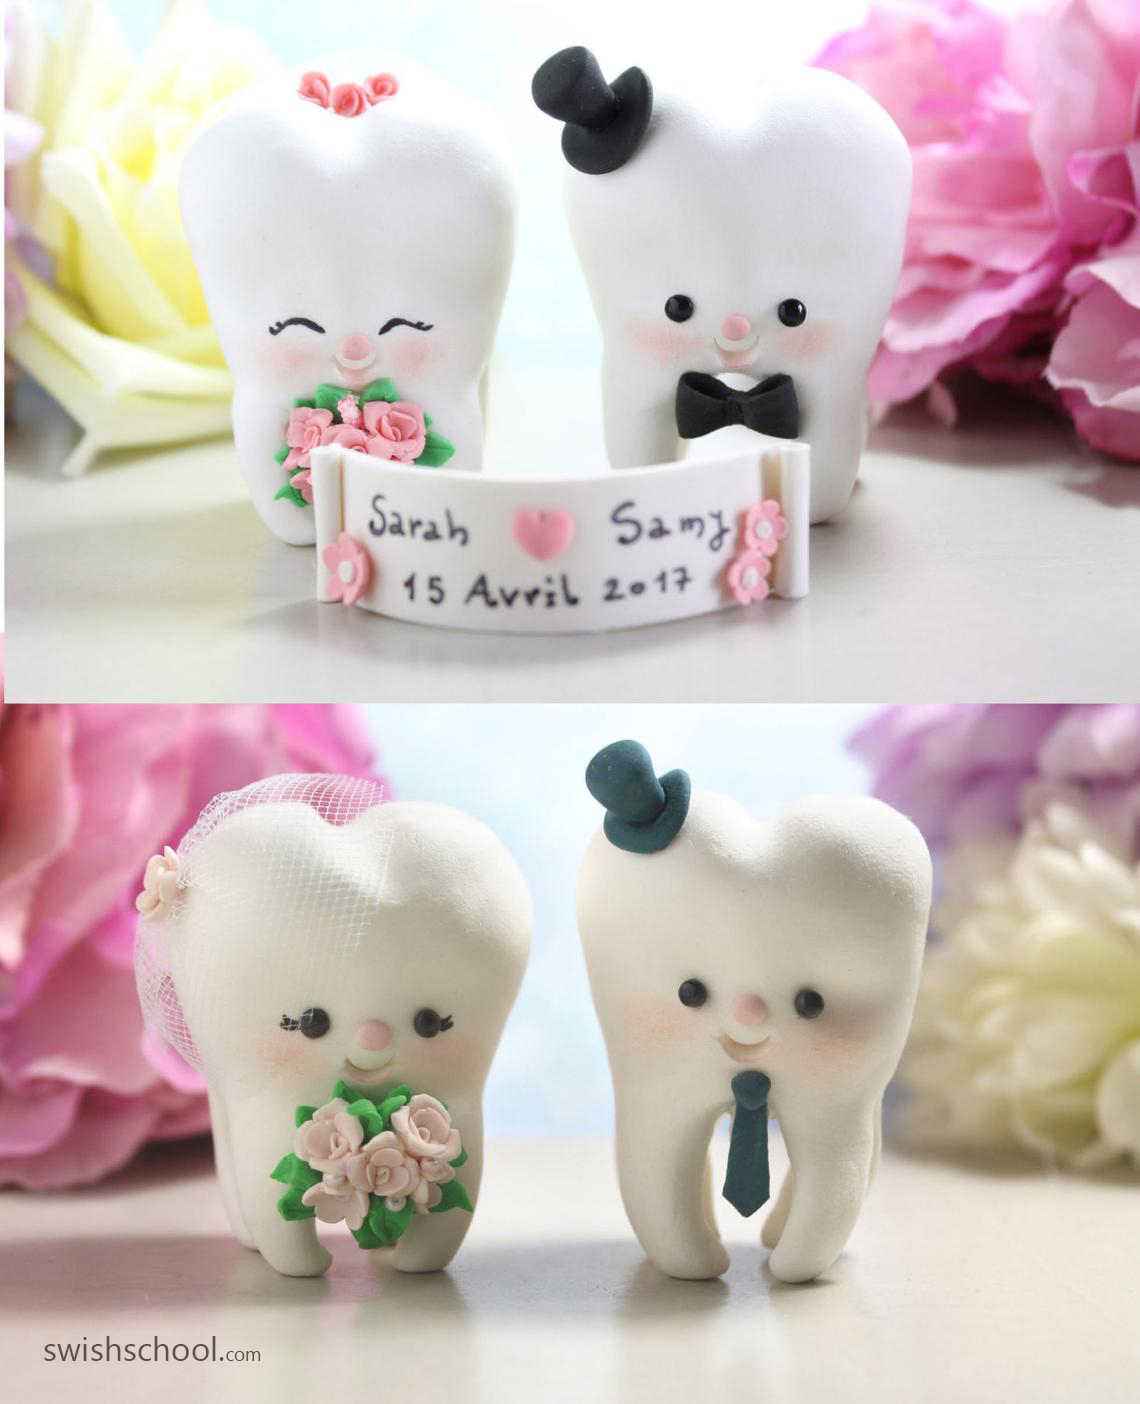 dentist wedding 10 صور زفاف اطباء الاسنان